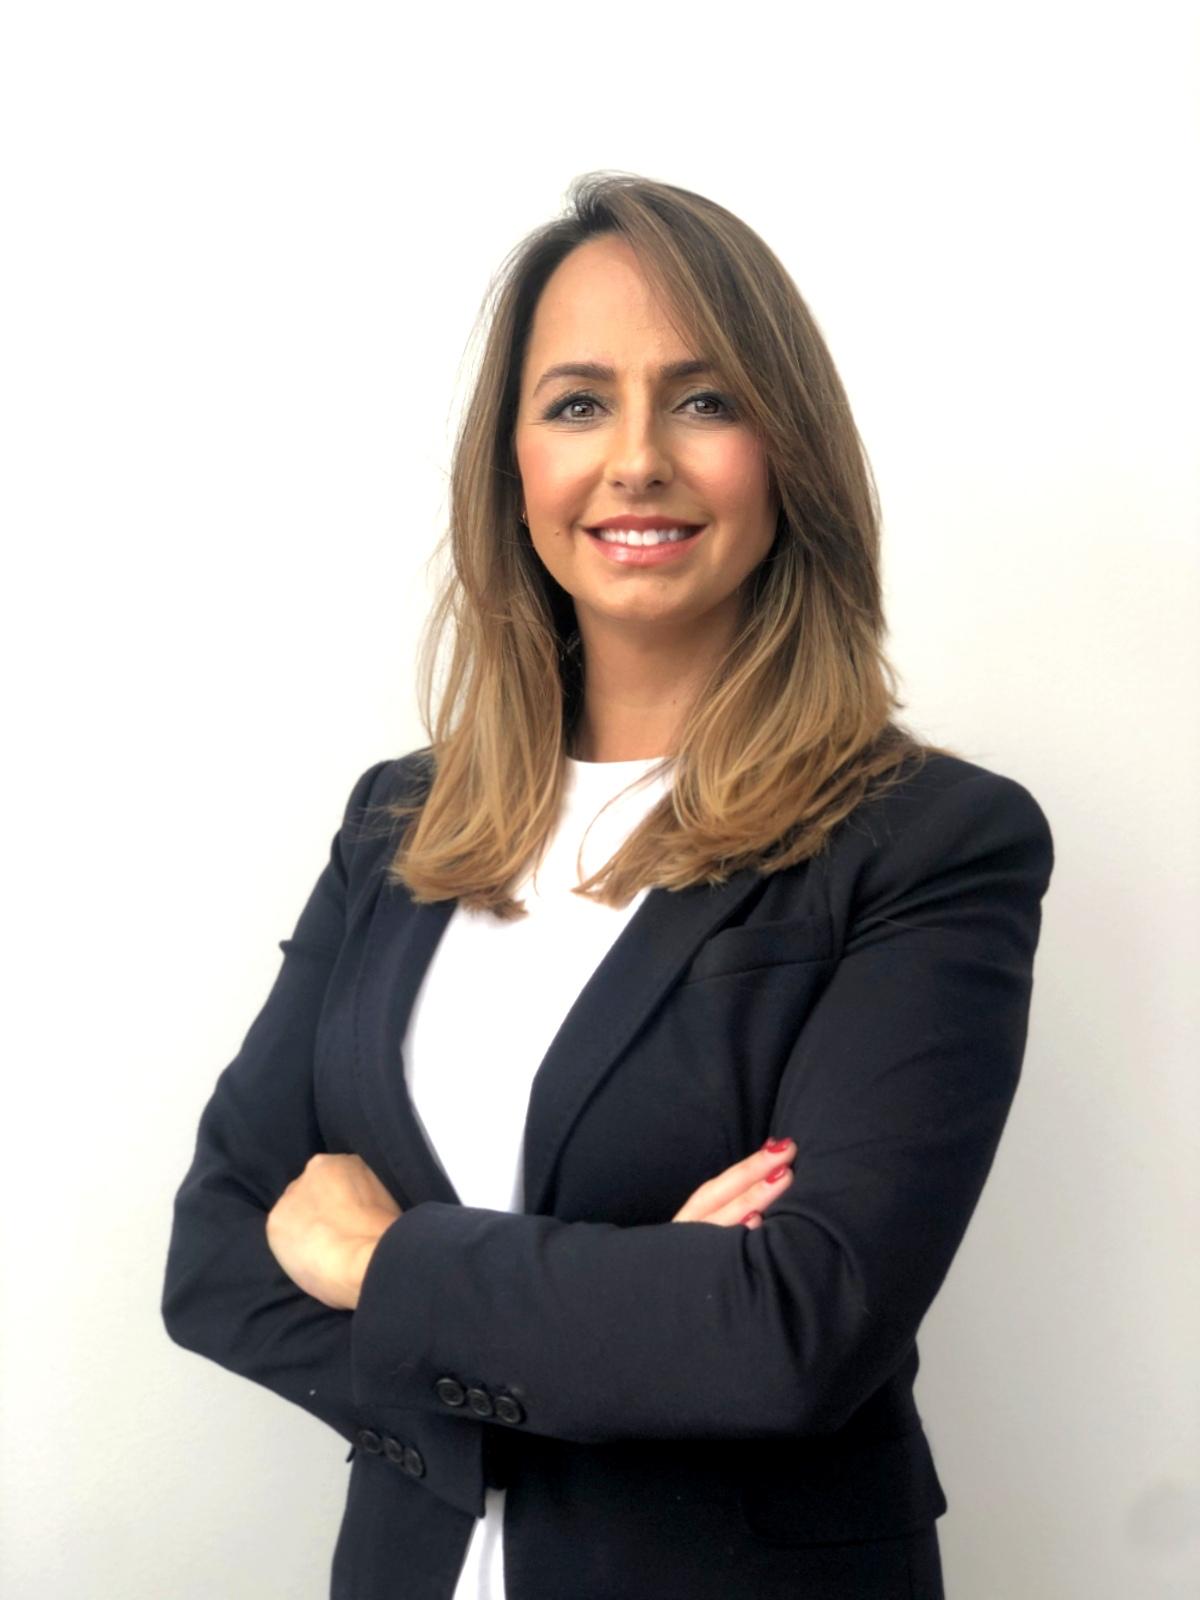 Bibiana Llompart Martínez